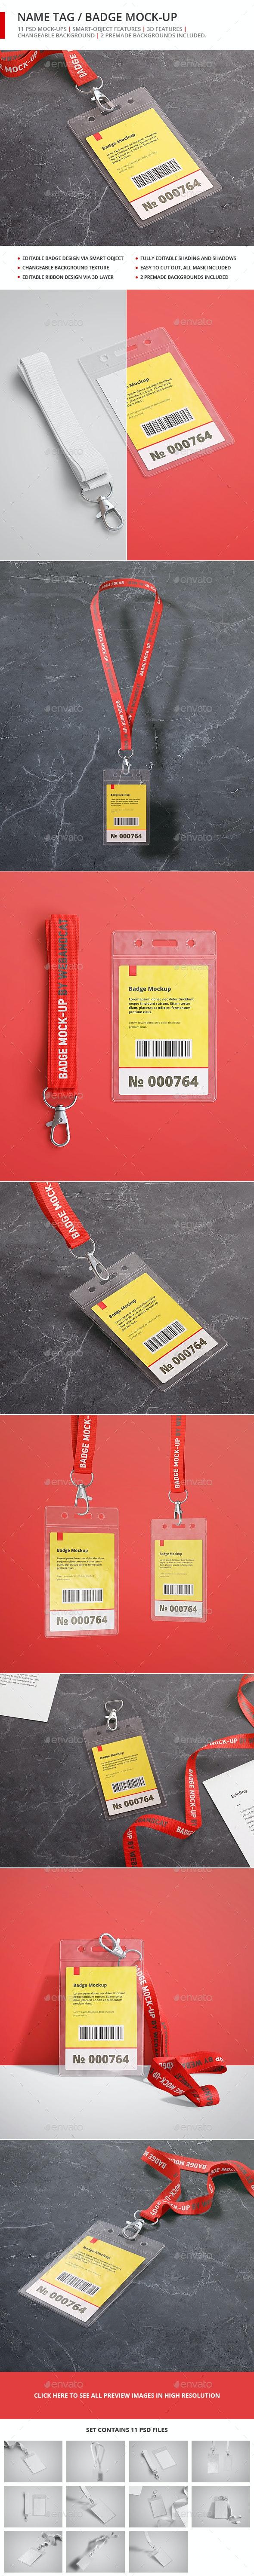 Name Tag / Badge Mock-up - Stationery Print